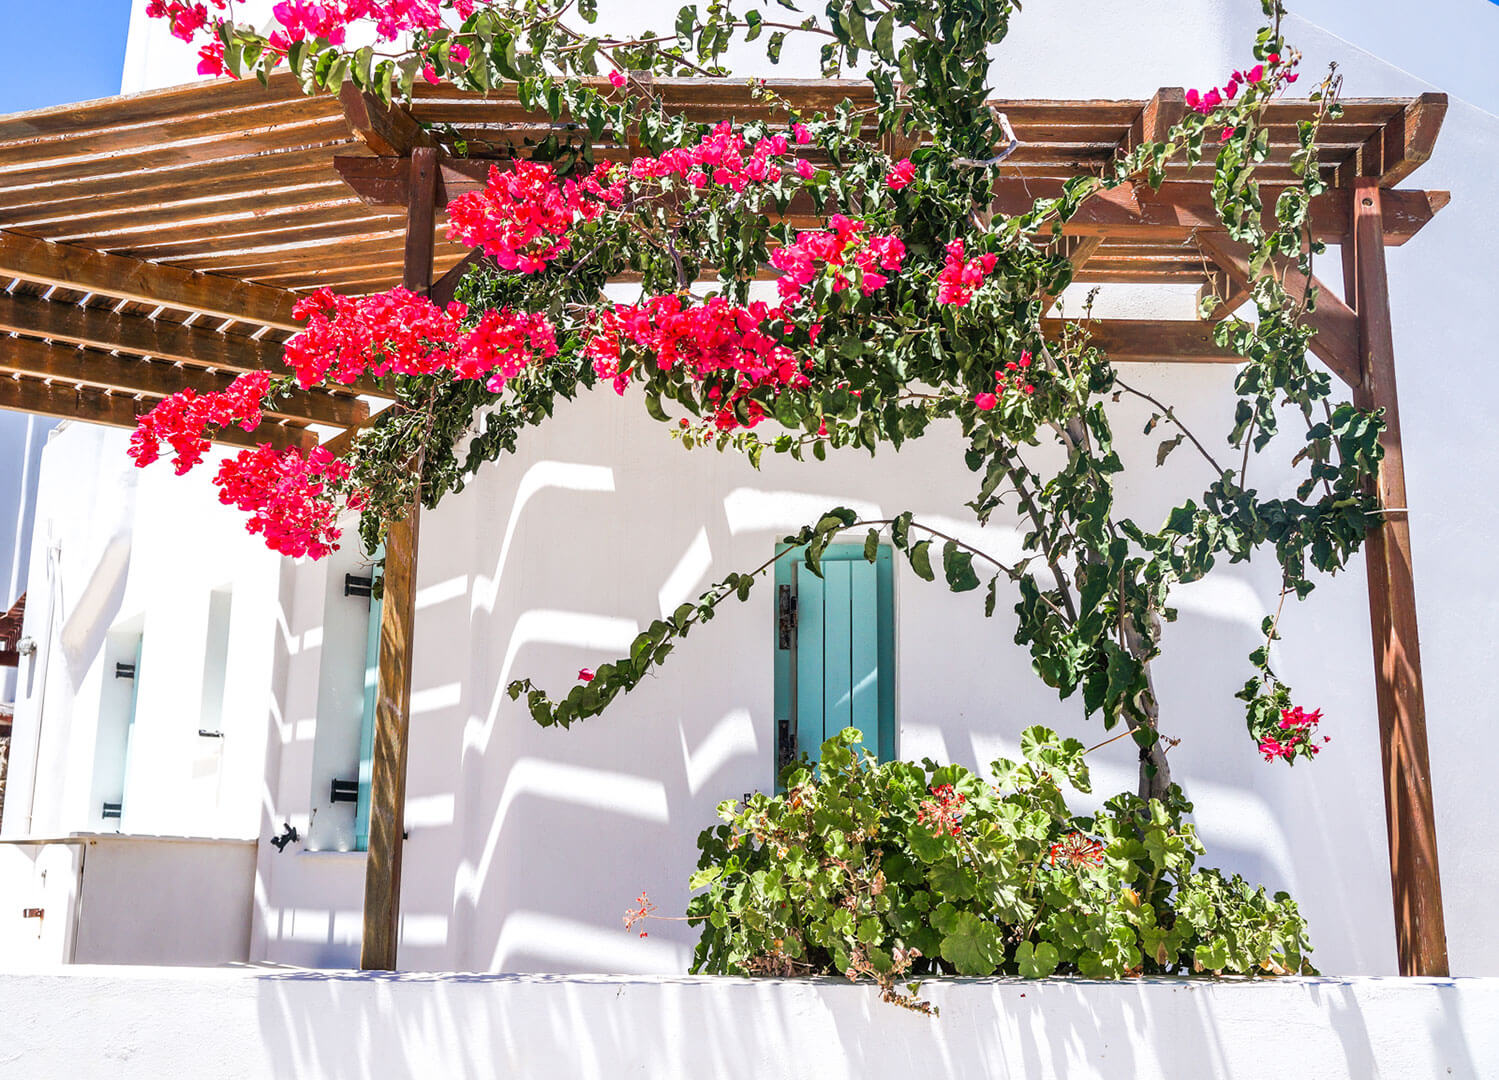 antiparos-greece-la-vie-en-blog-all-rights-reserved